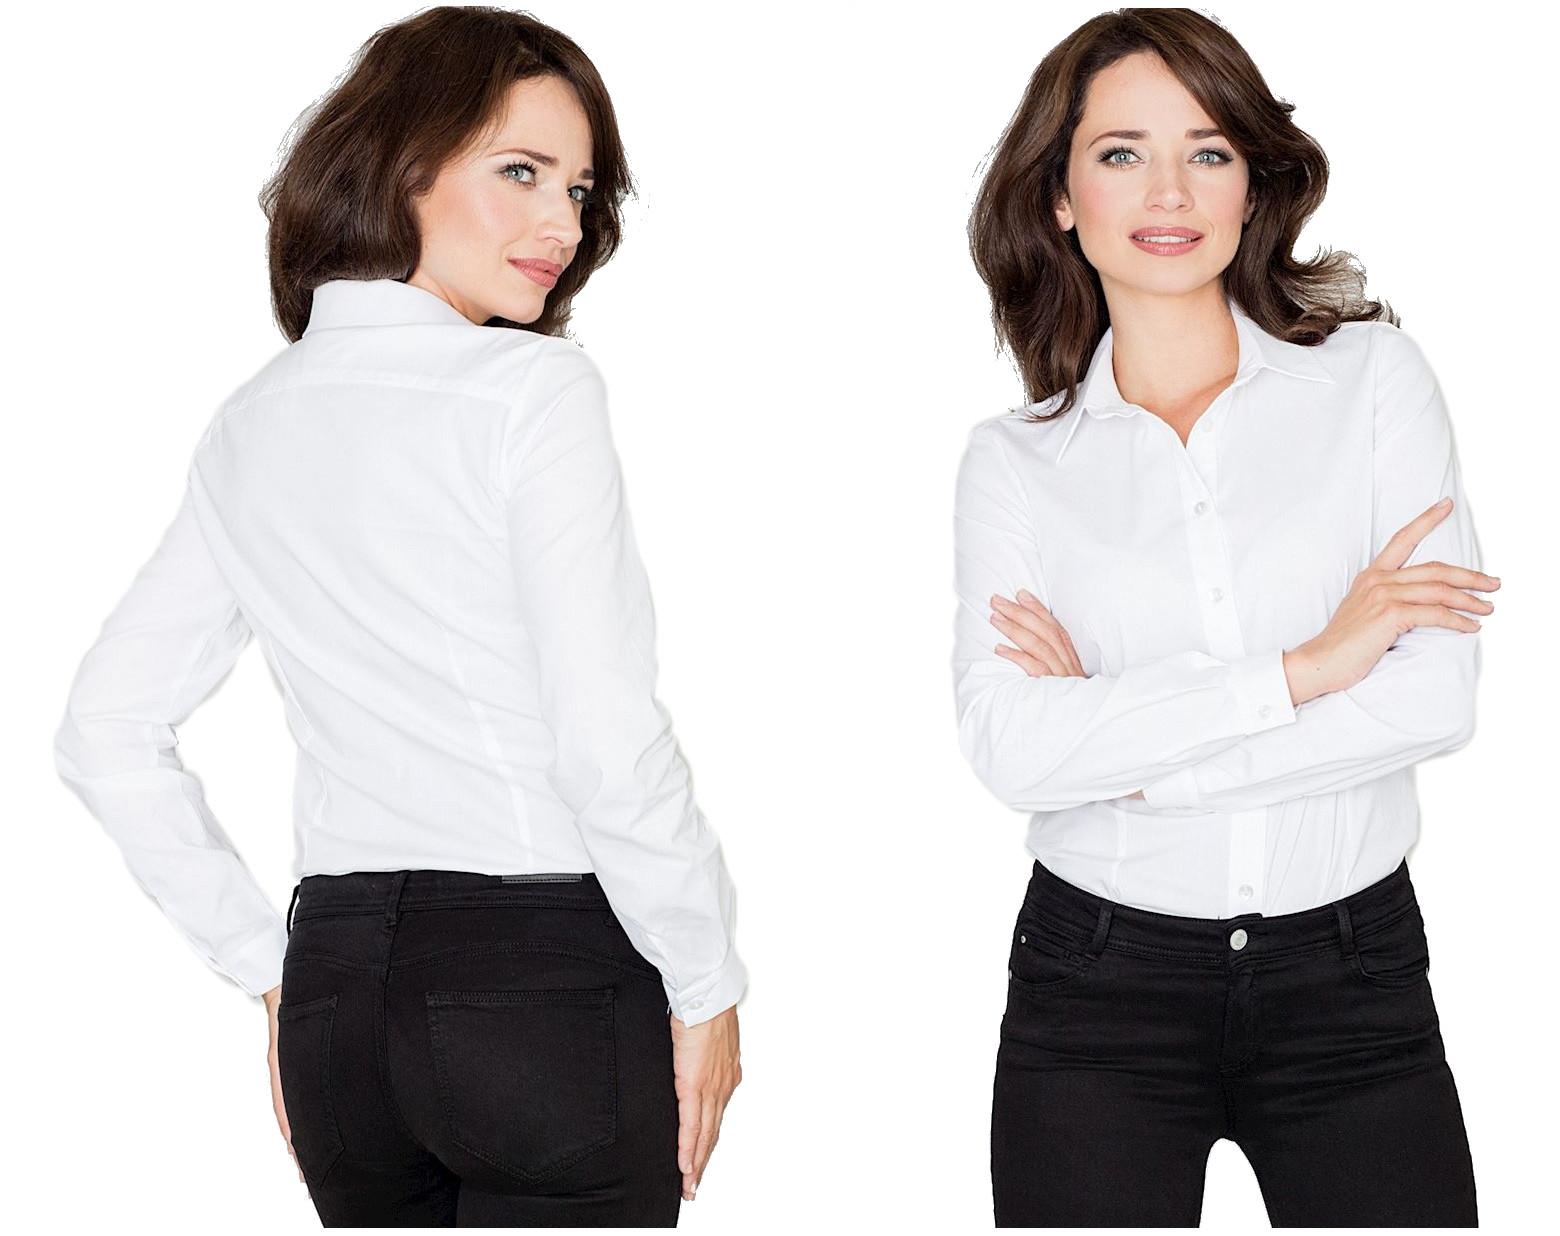 Koszule damskie w Body Allegro.pl